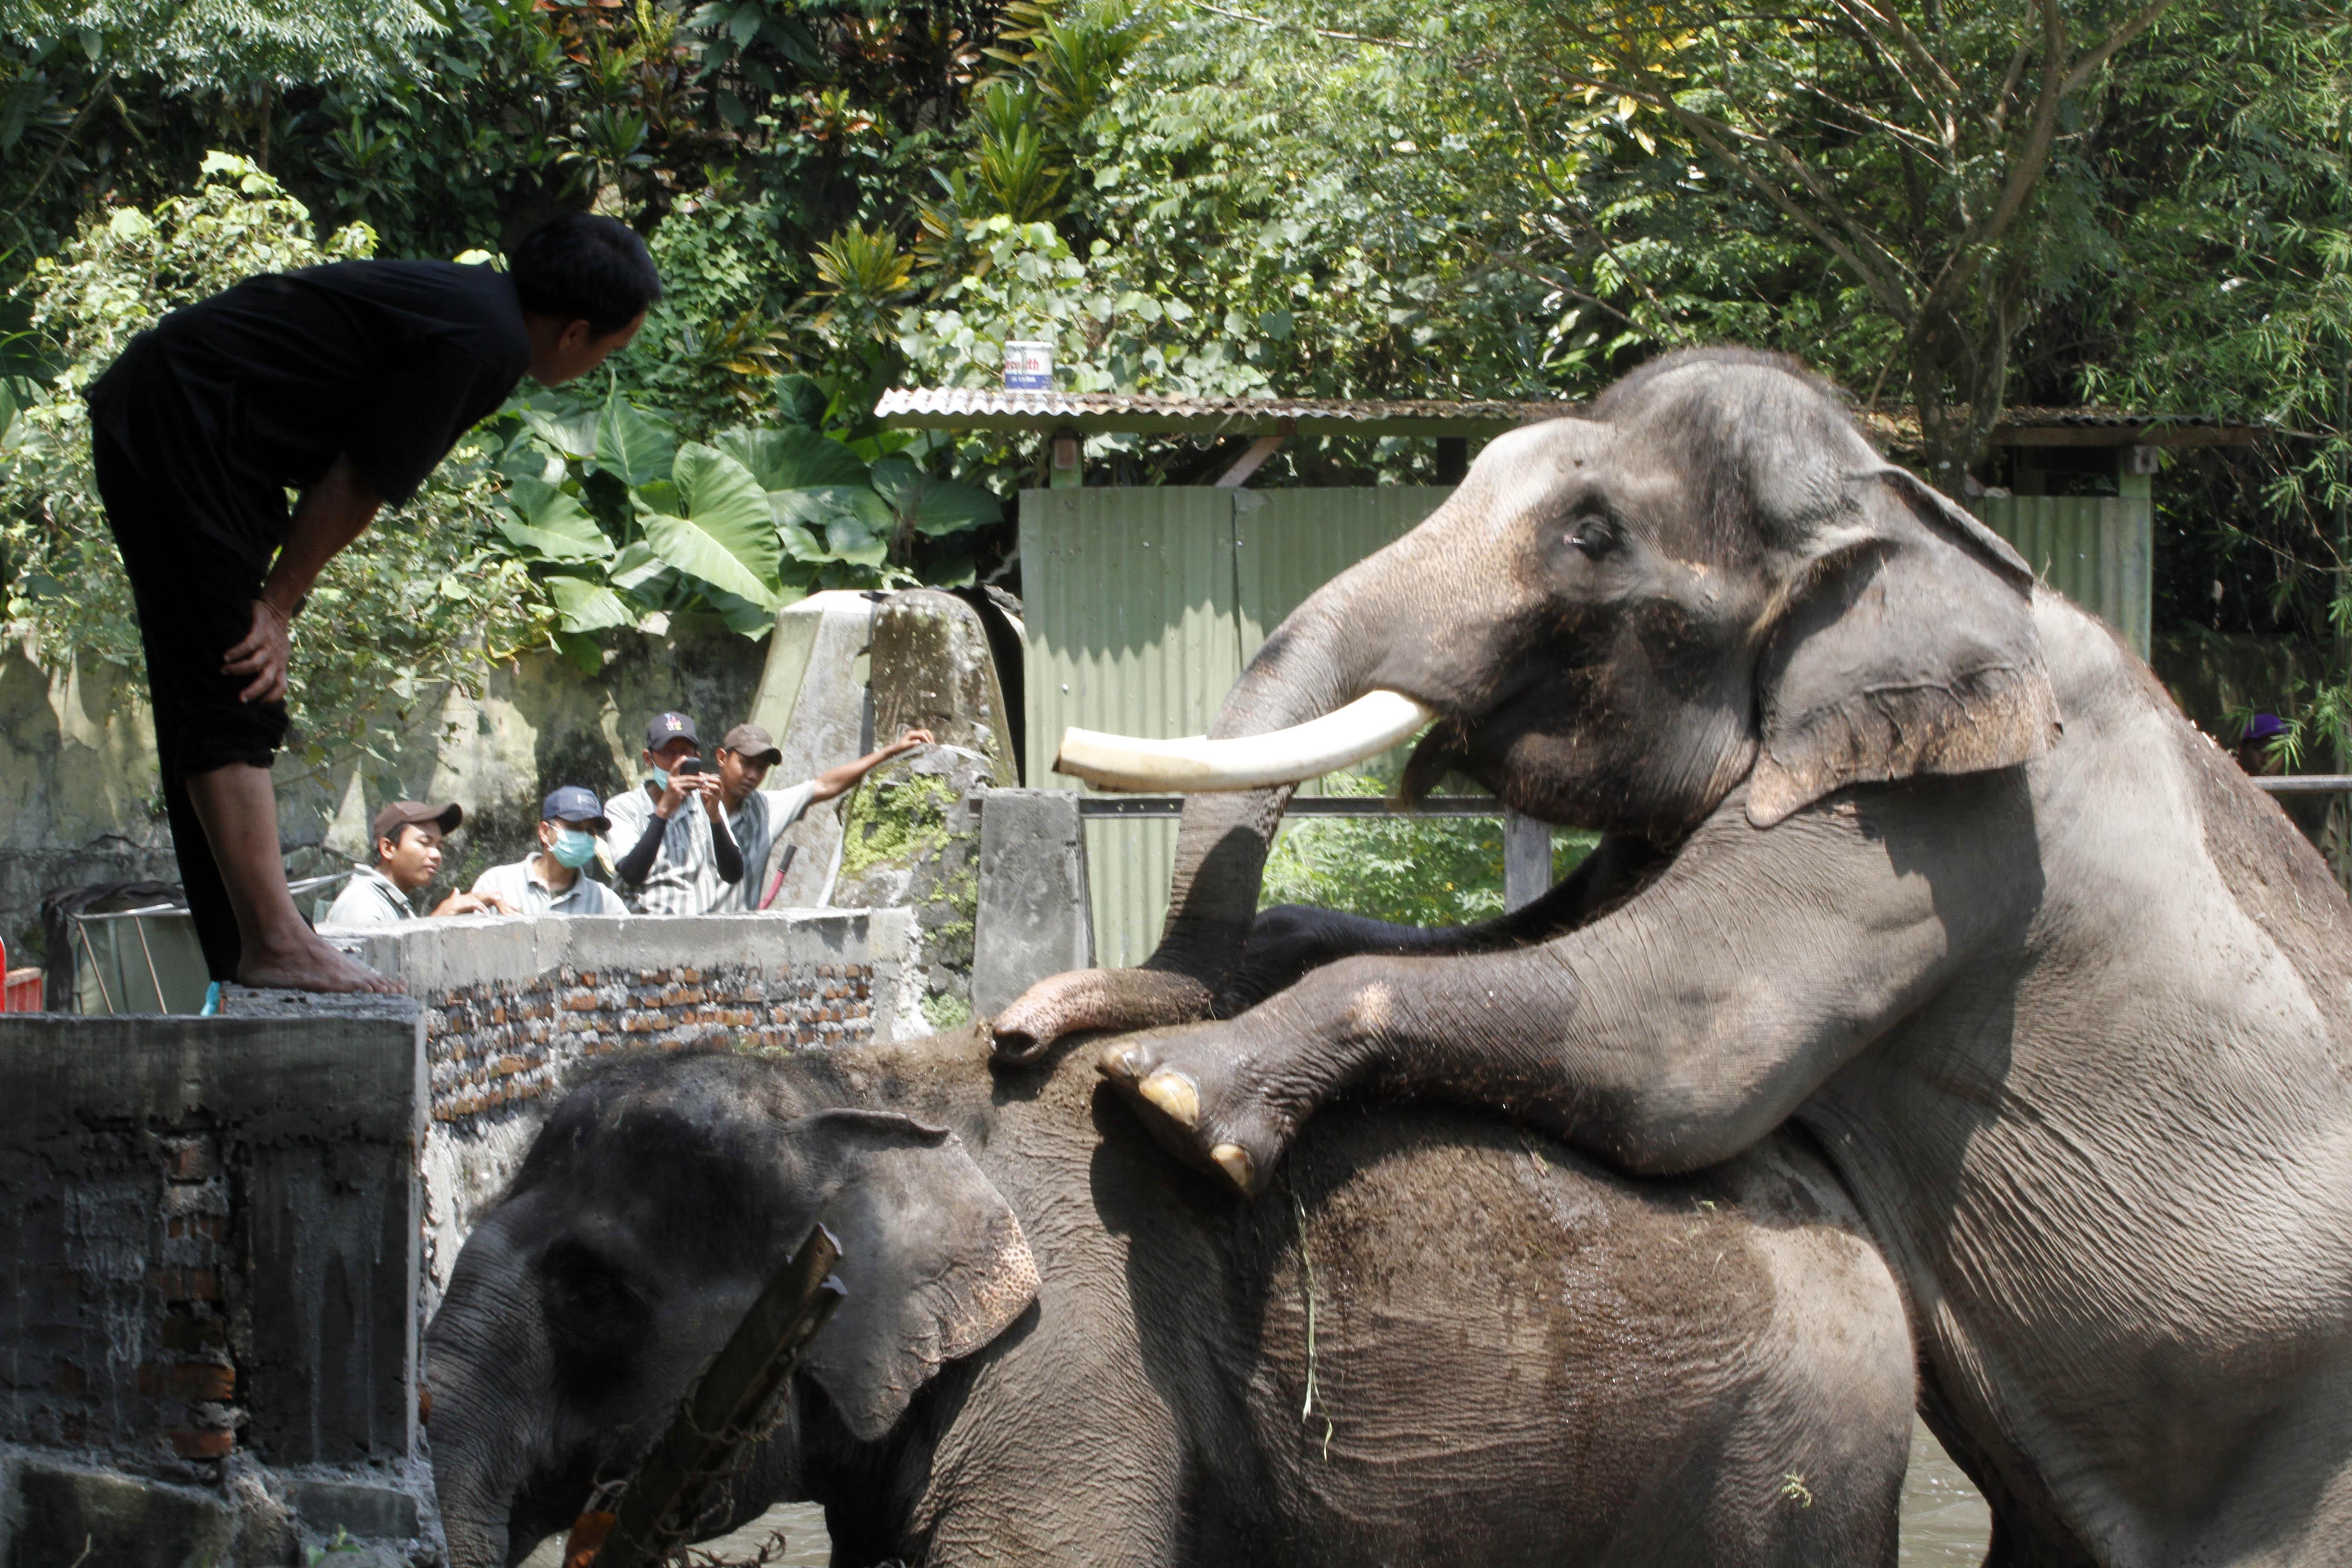 Kebun Binatang Gembiraloka Yogyakarta Berita Daerah Bonbin Gembira Loka Kota